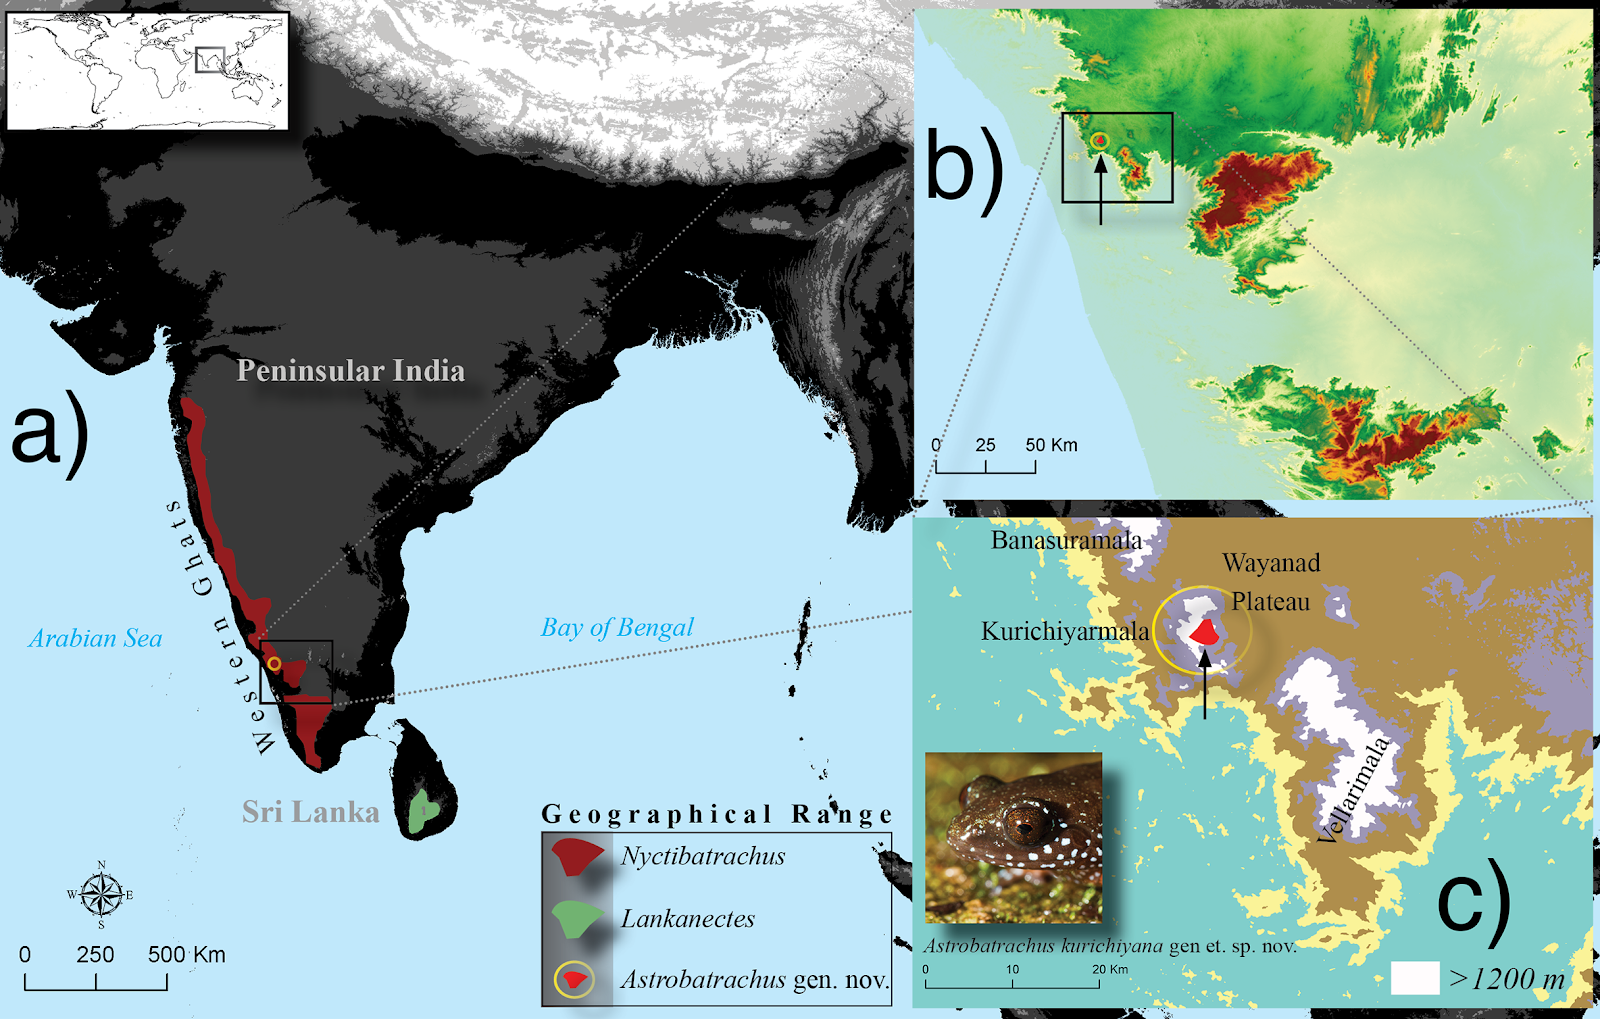 Geographical range (A) of the three genera, Nyctibatrachus (Nyctibatrachinae), Lankanectes (Lankanectinae) and the new genus Astrobatrachus